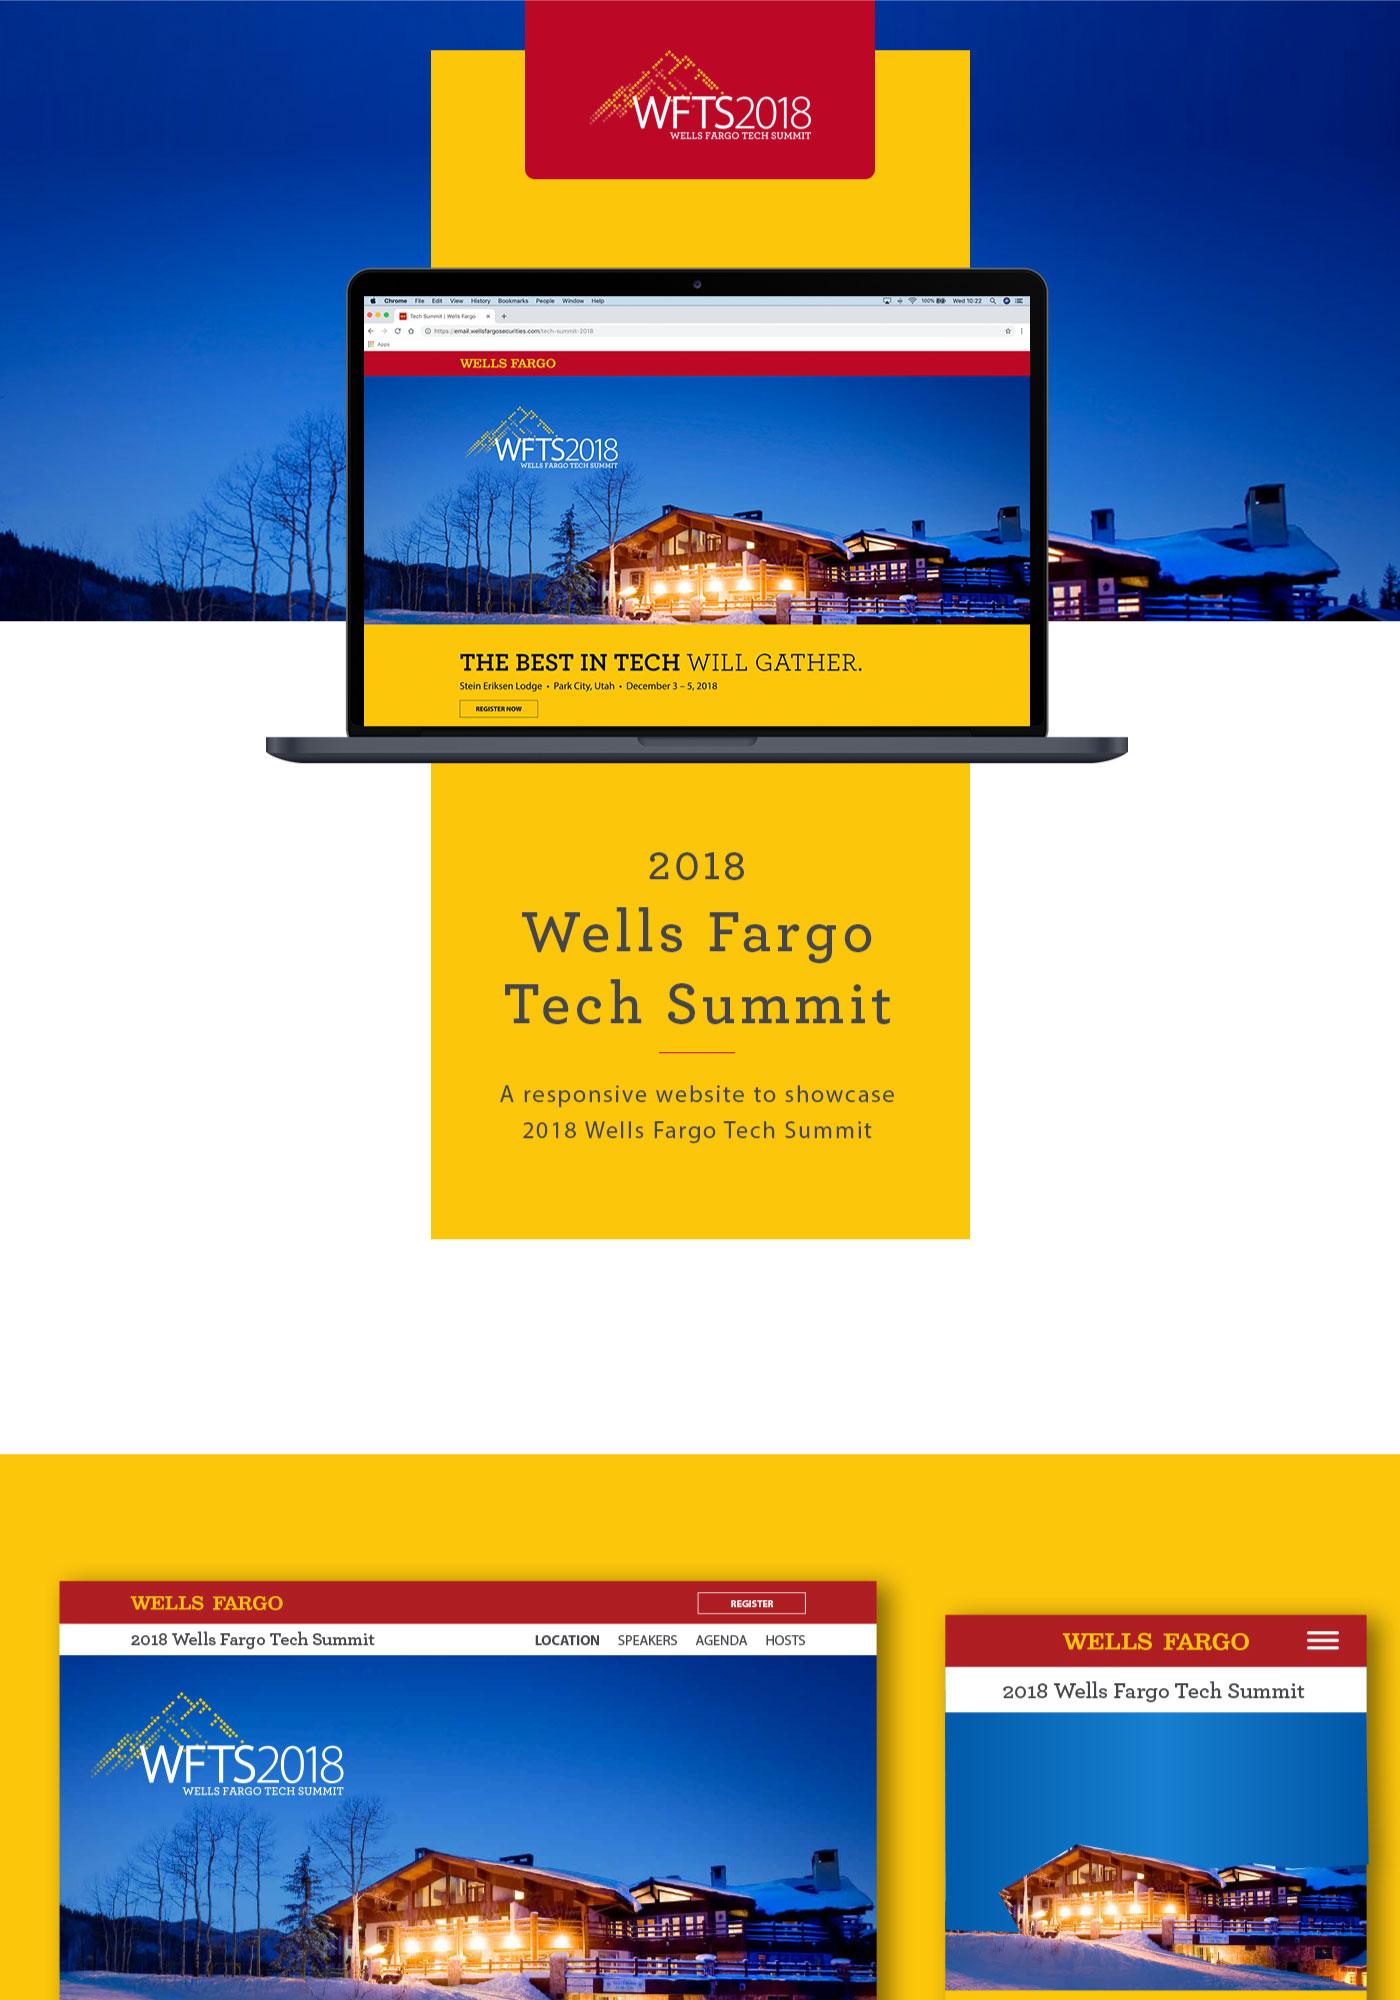 Wells Fargo Tech Summit website shown on a laptop